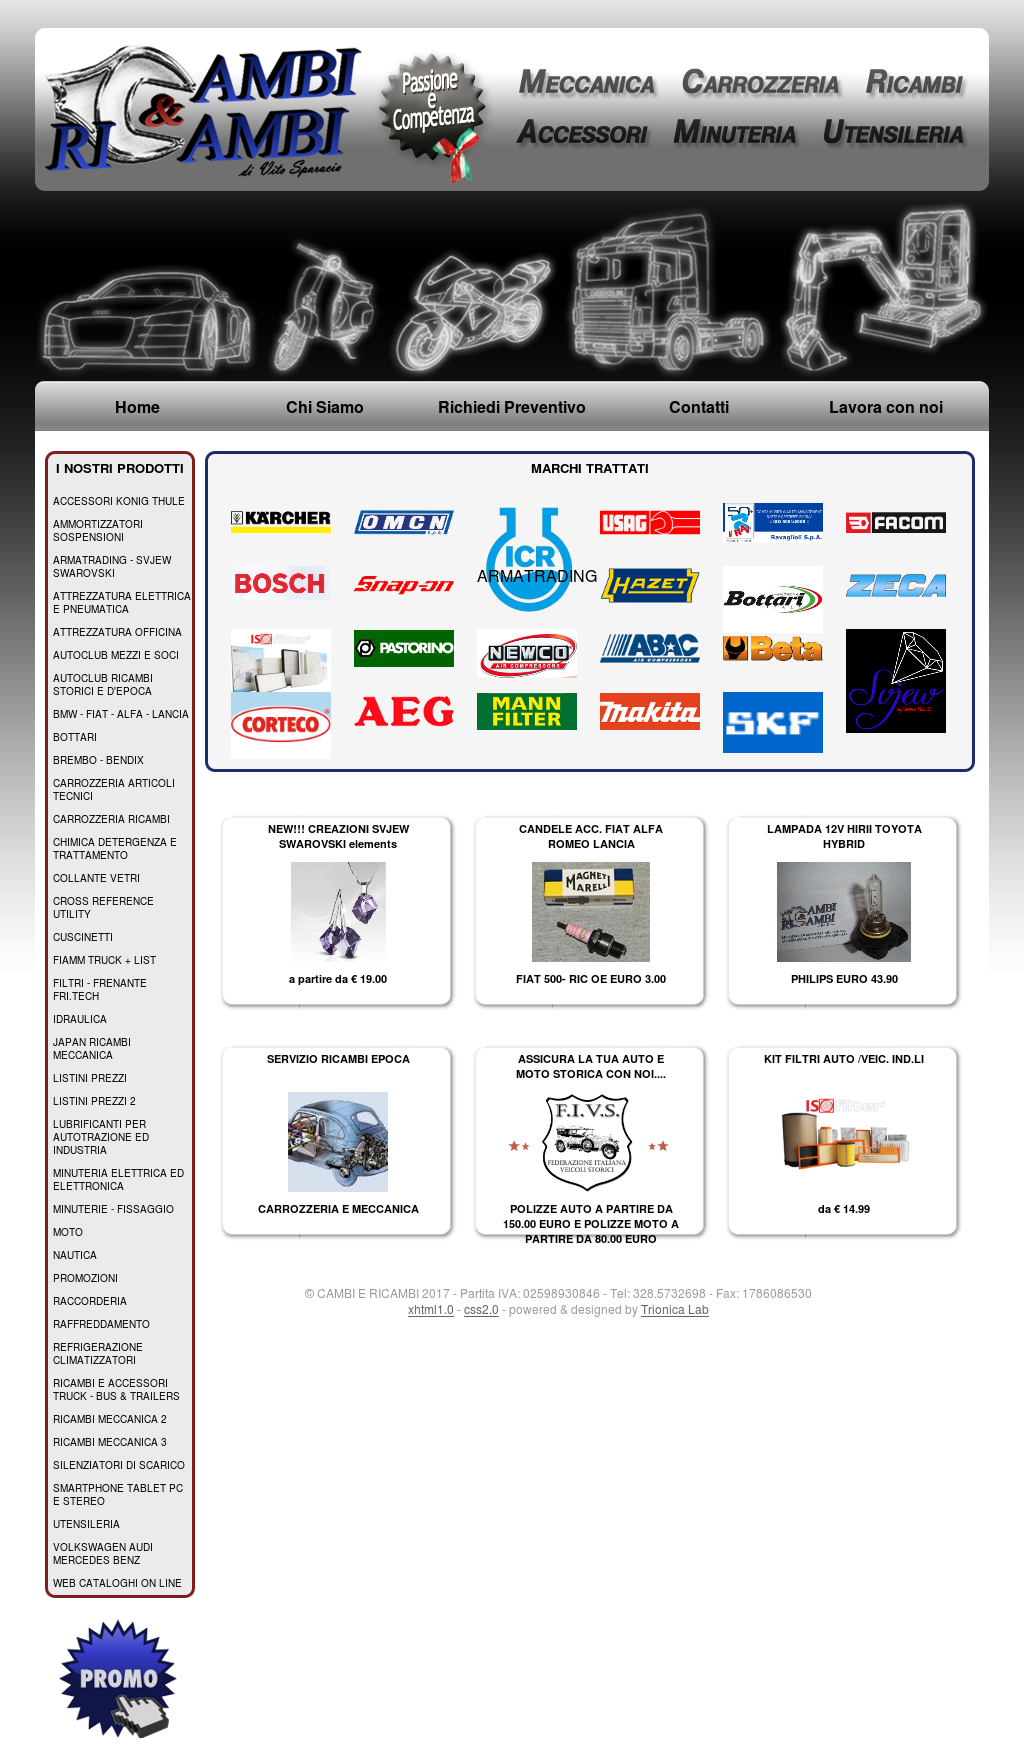 Cambi E Ricambi Competitors, Revenue and Employees - Owler Company